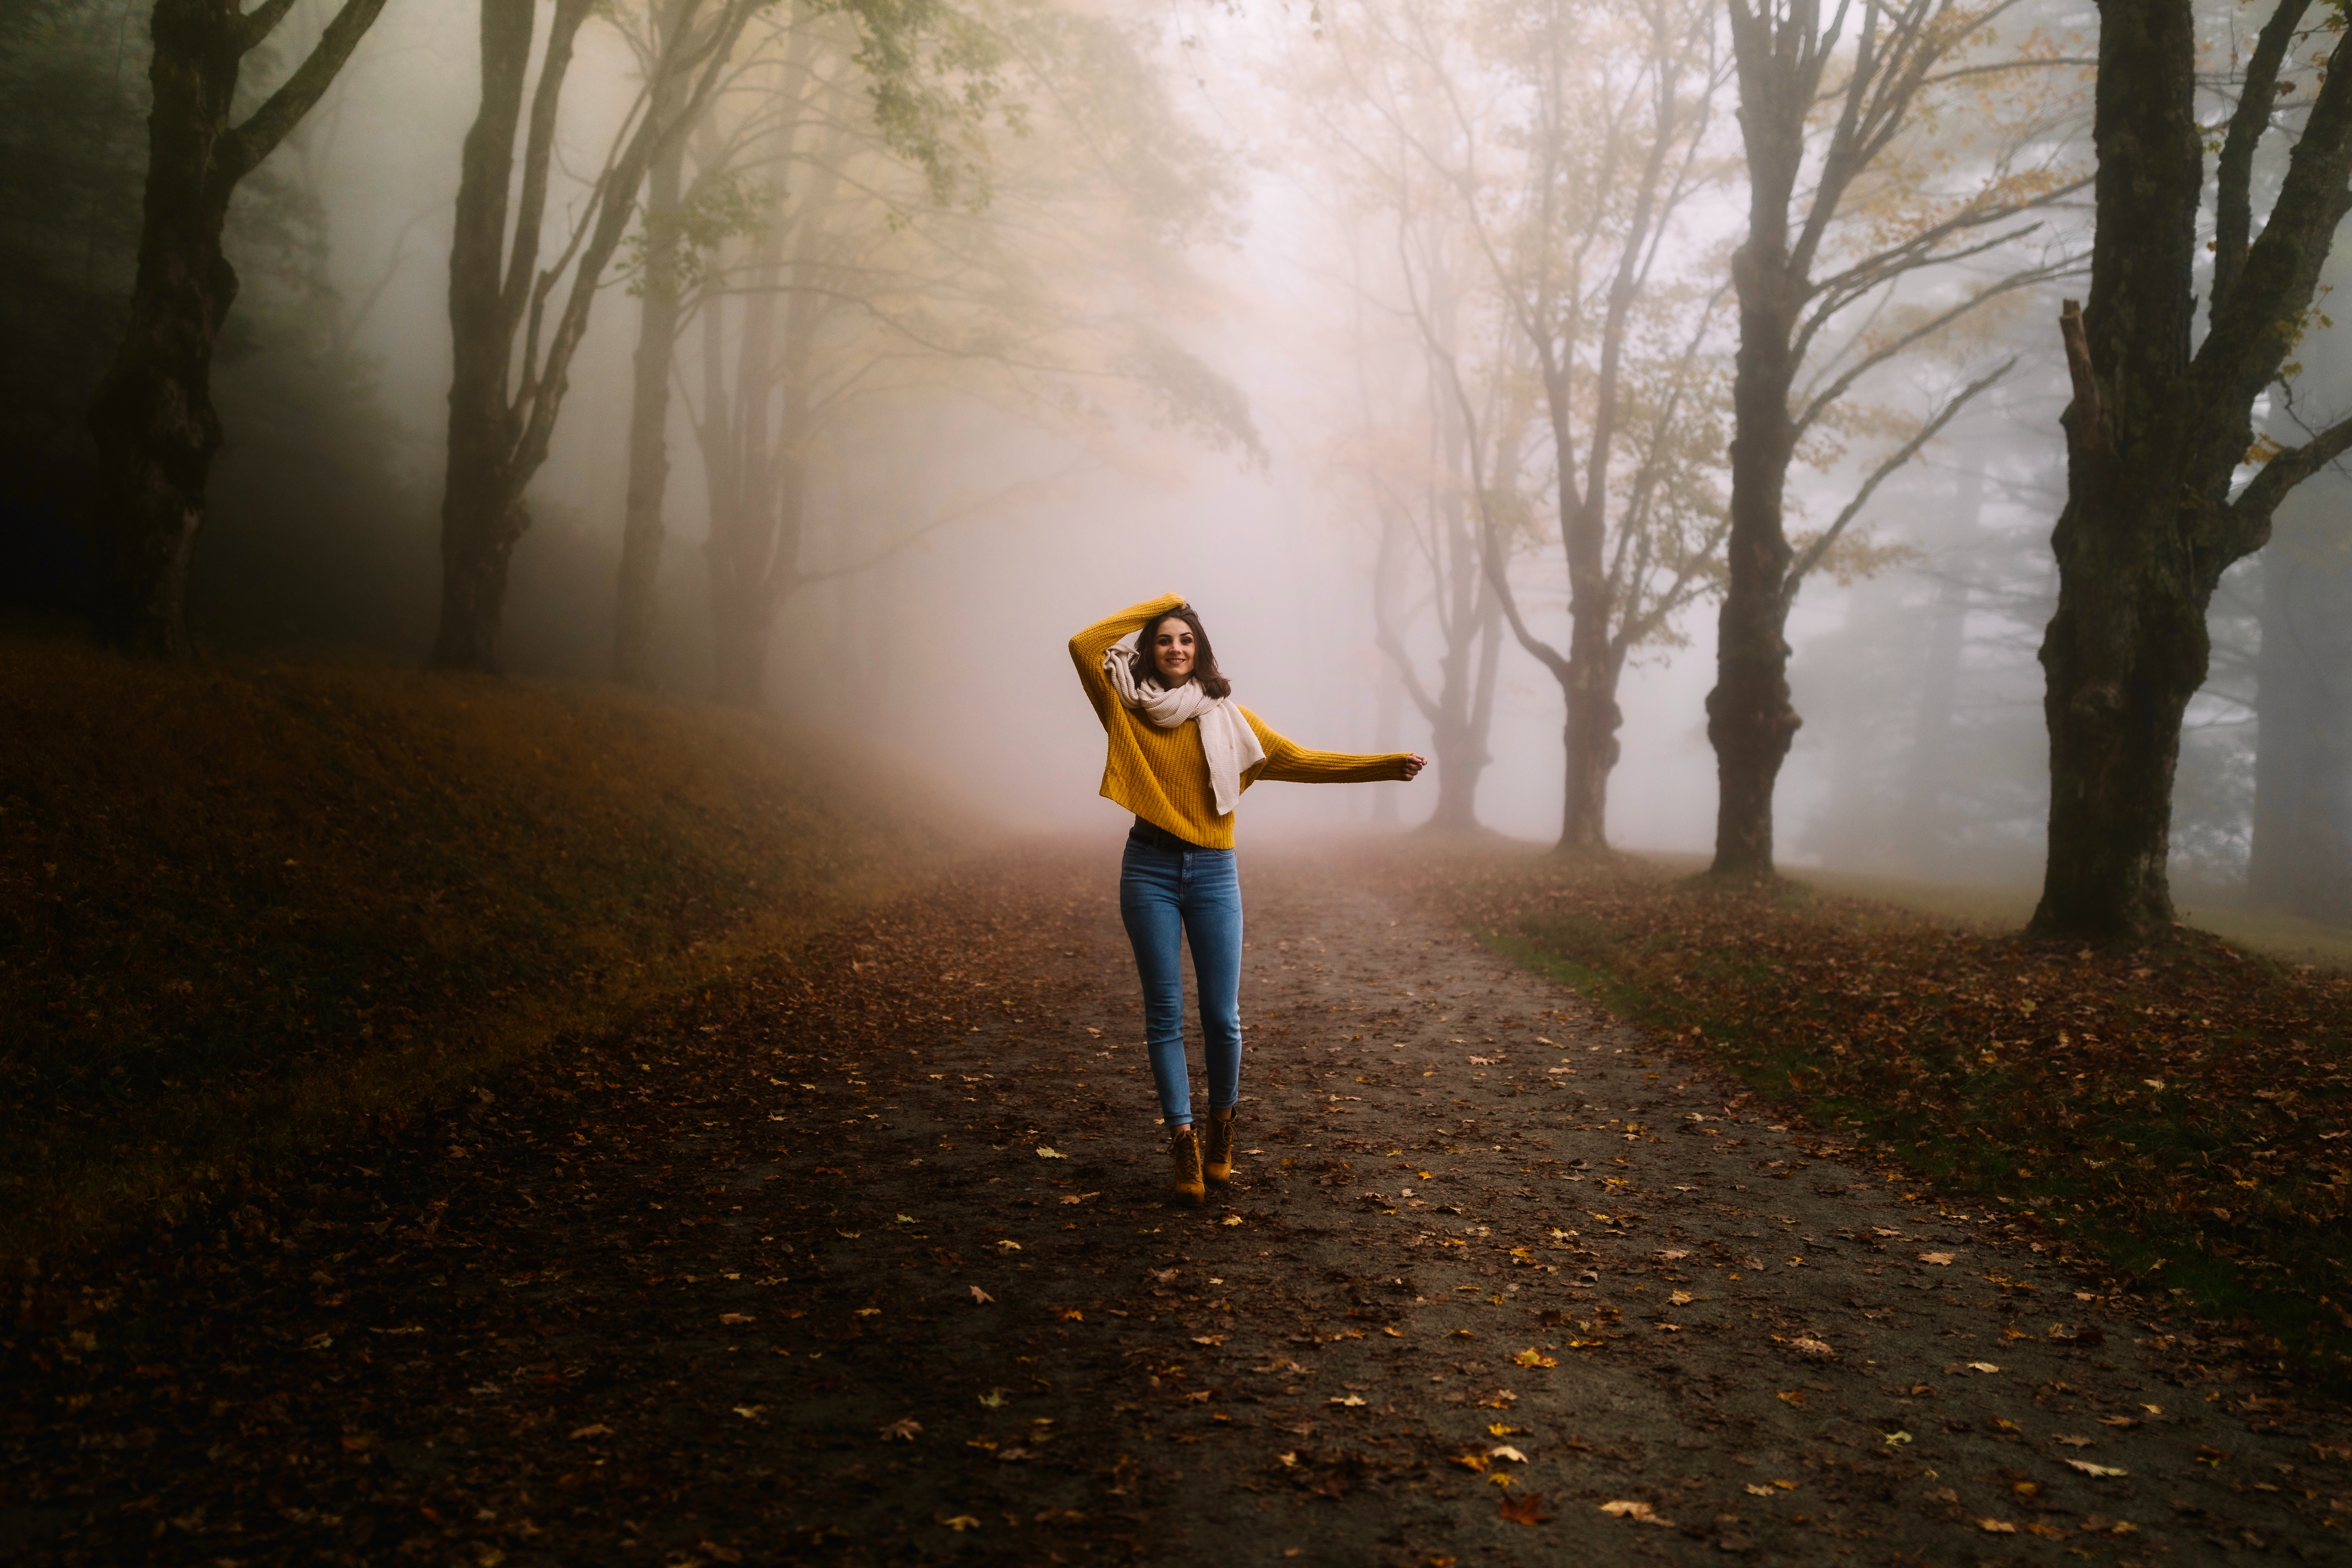 girl winter alone road fog 1574938641 - Girl Winter Alone Road Fog -